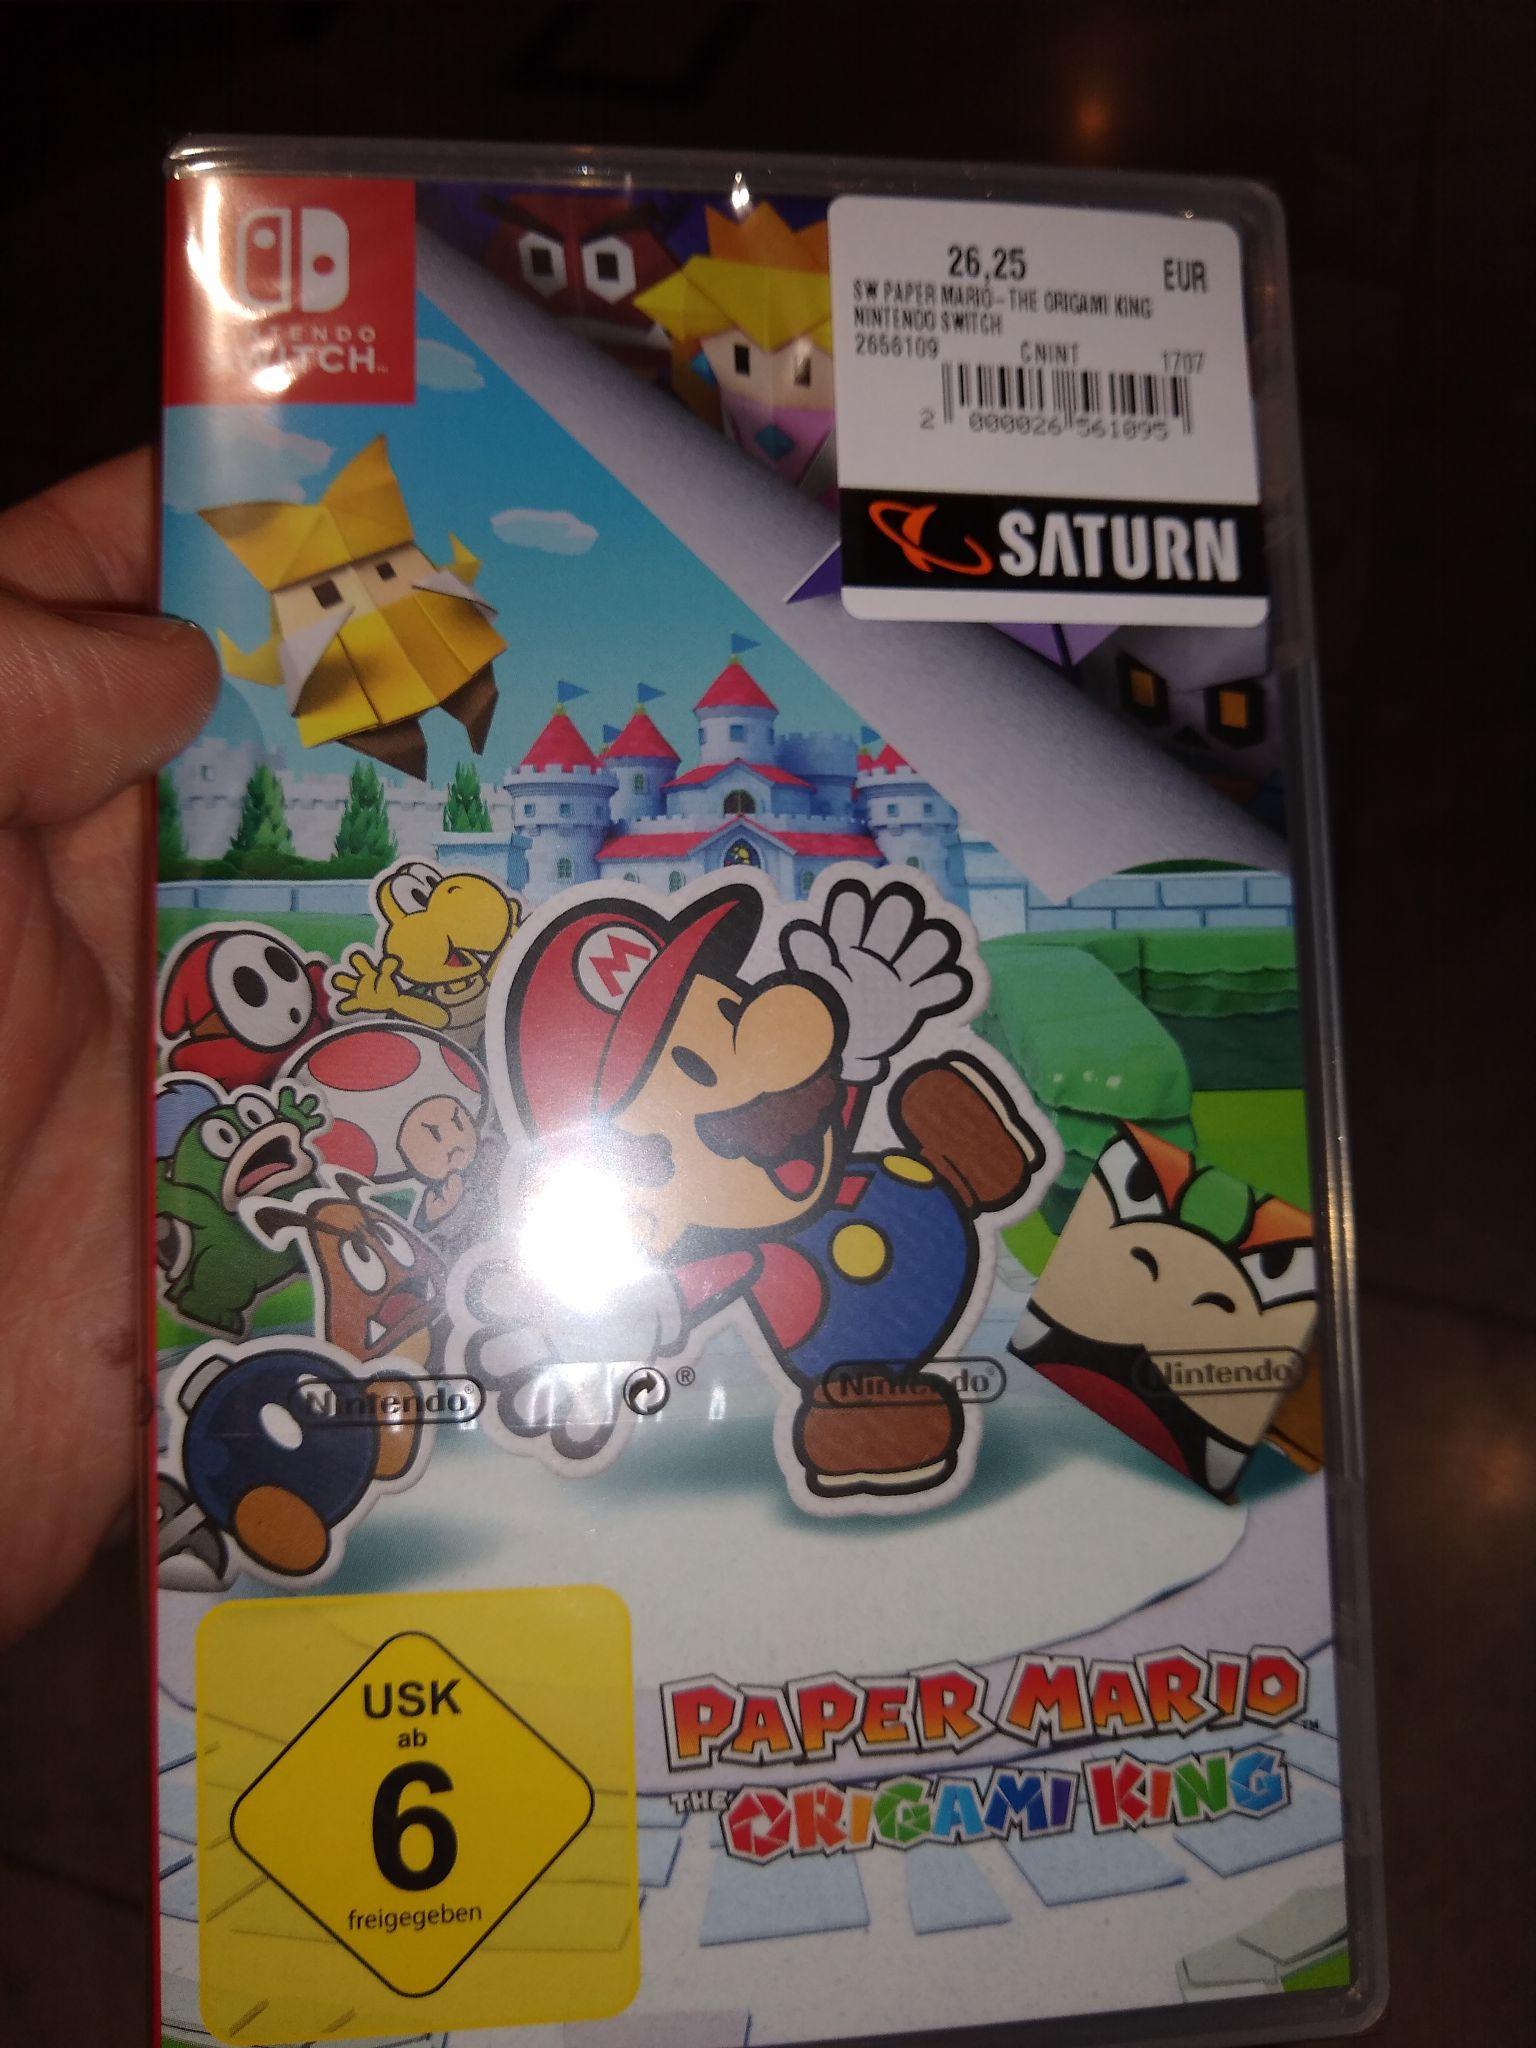 Lokal Deal Esslingen Saturn (Preisfehler)/ Paper Mario switch